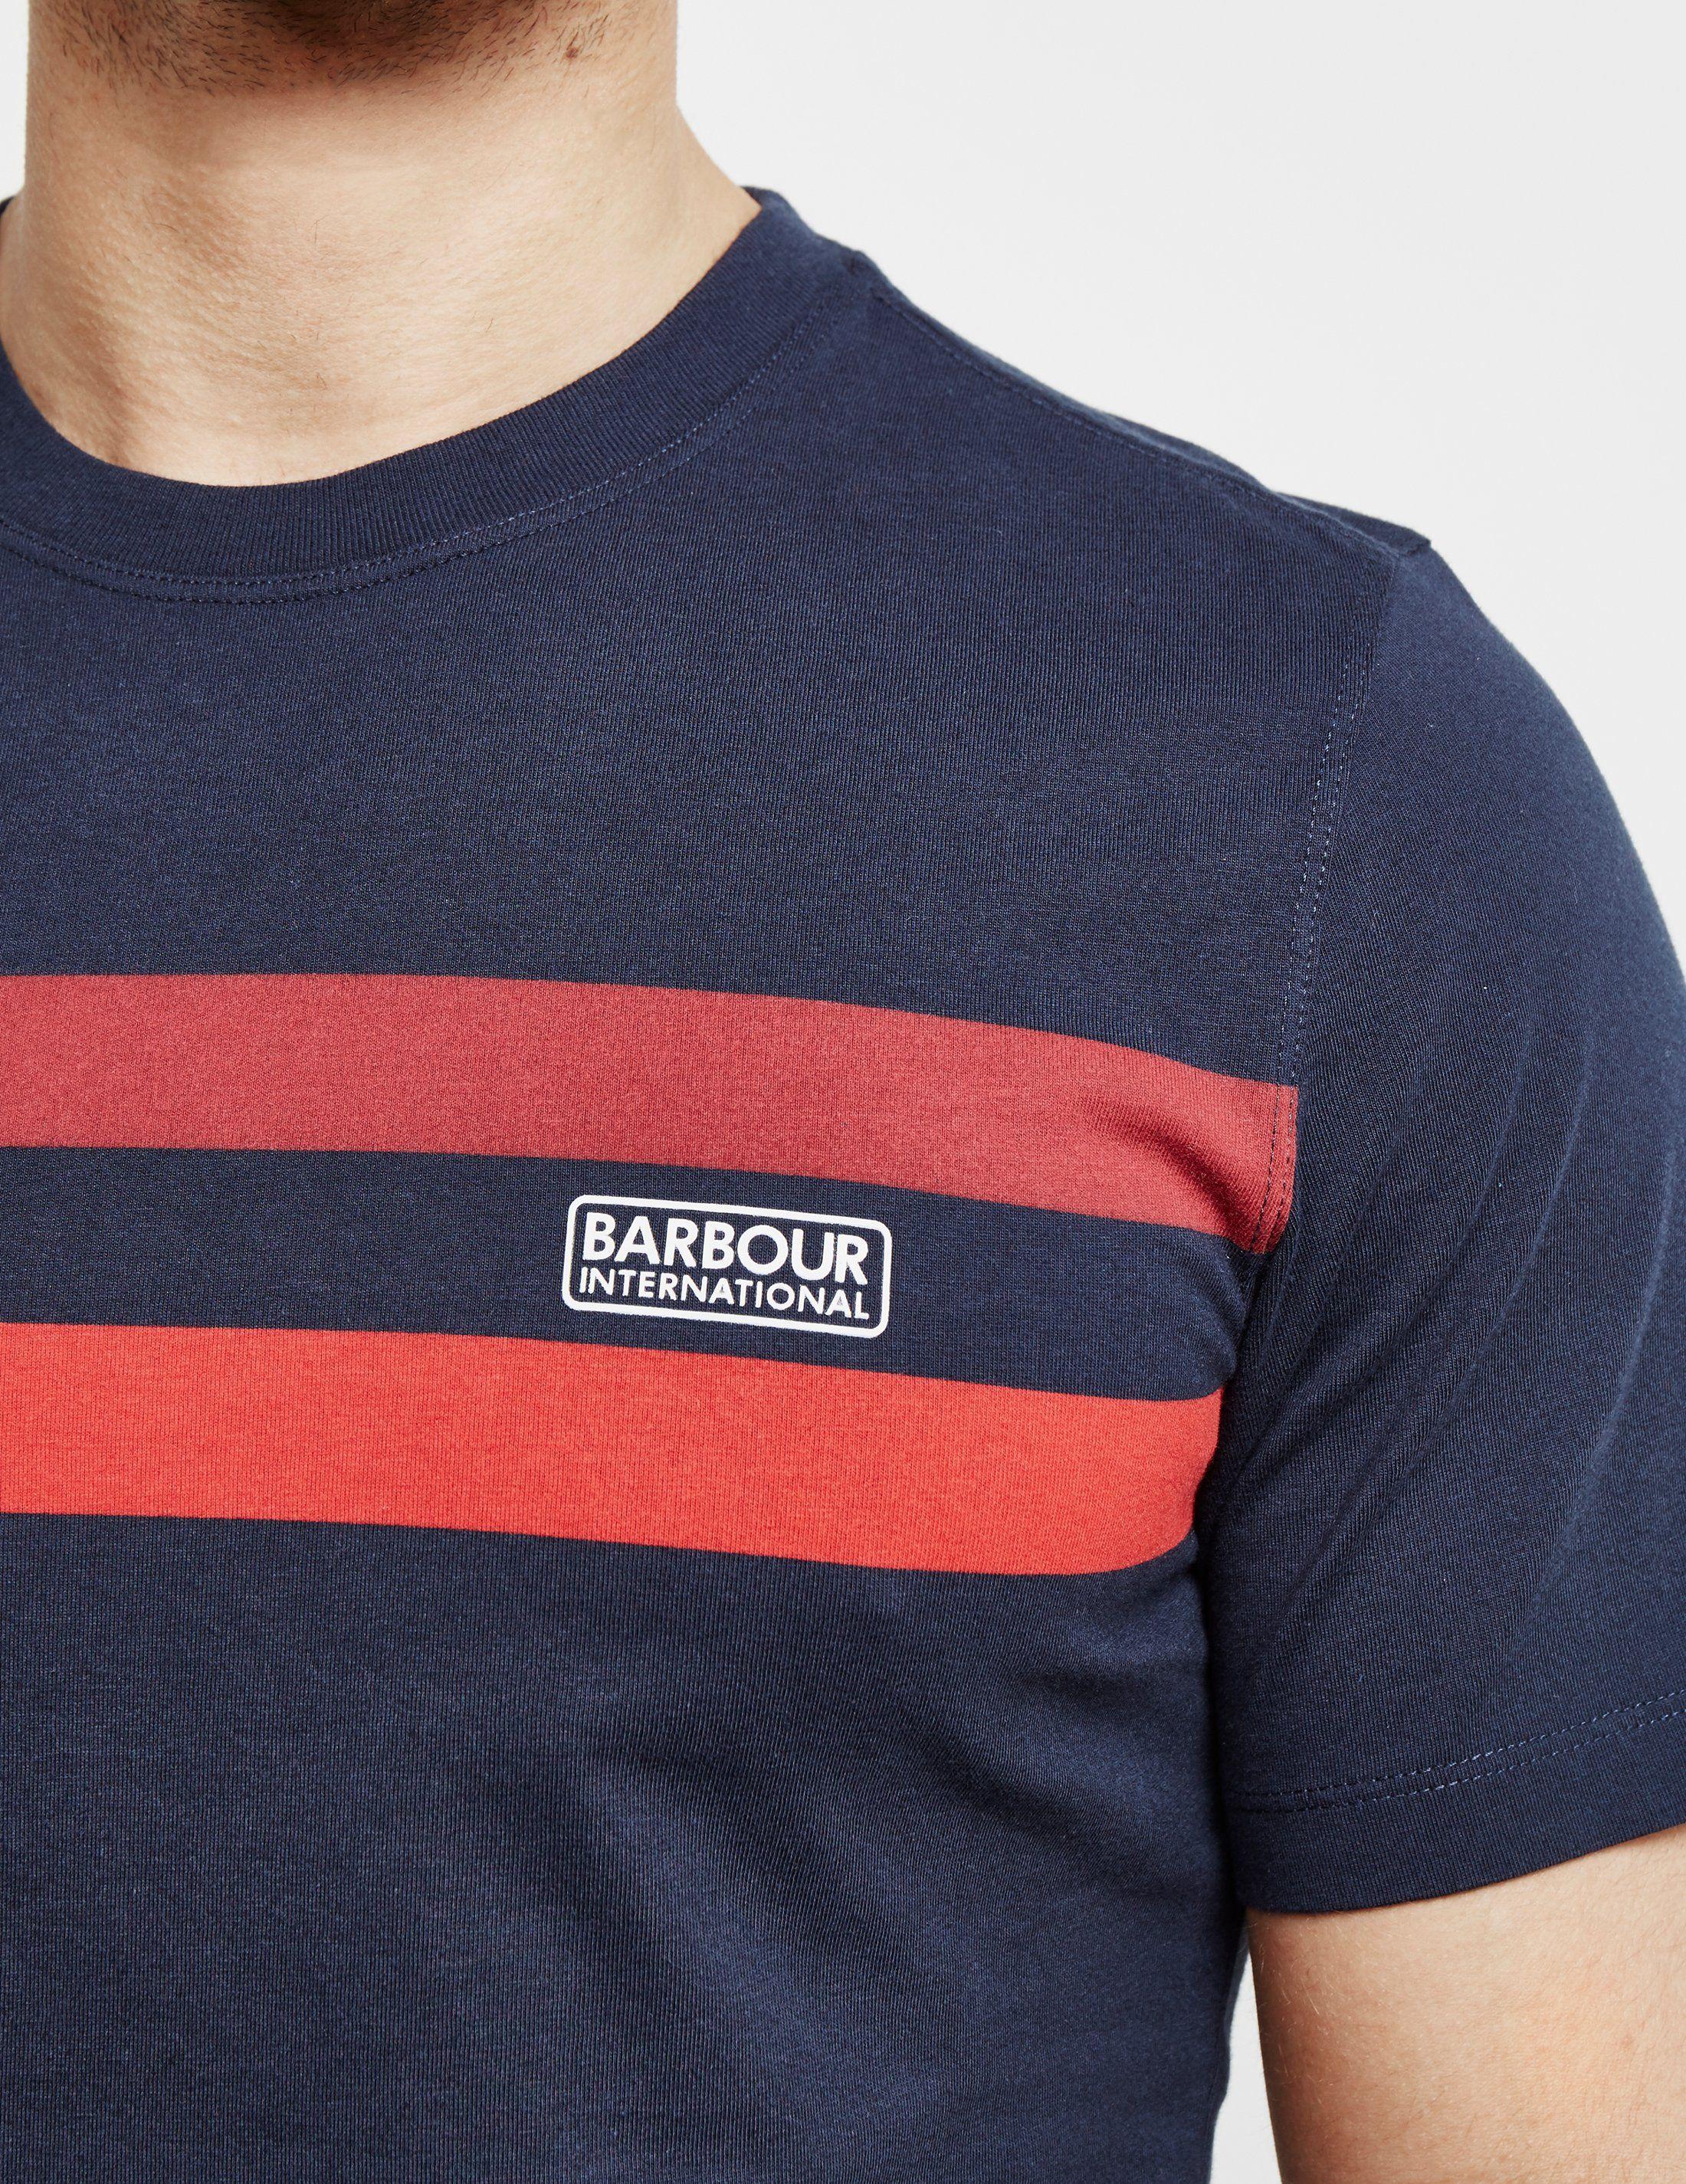 Barbour International Circuit Short Sleeve T-Shirt